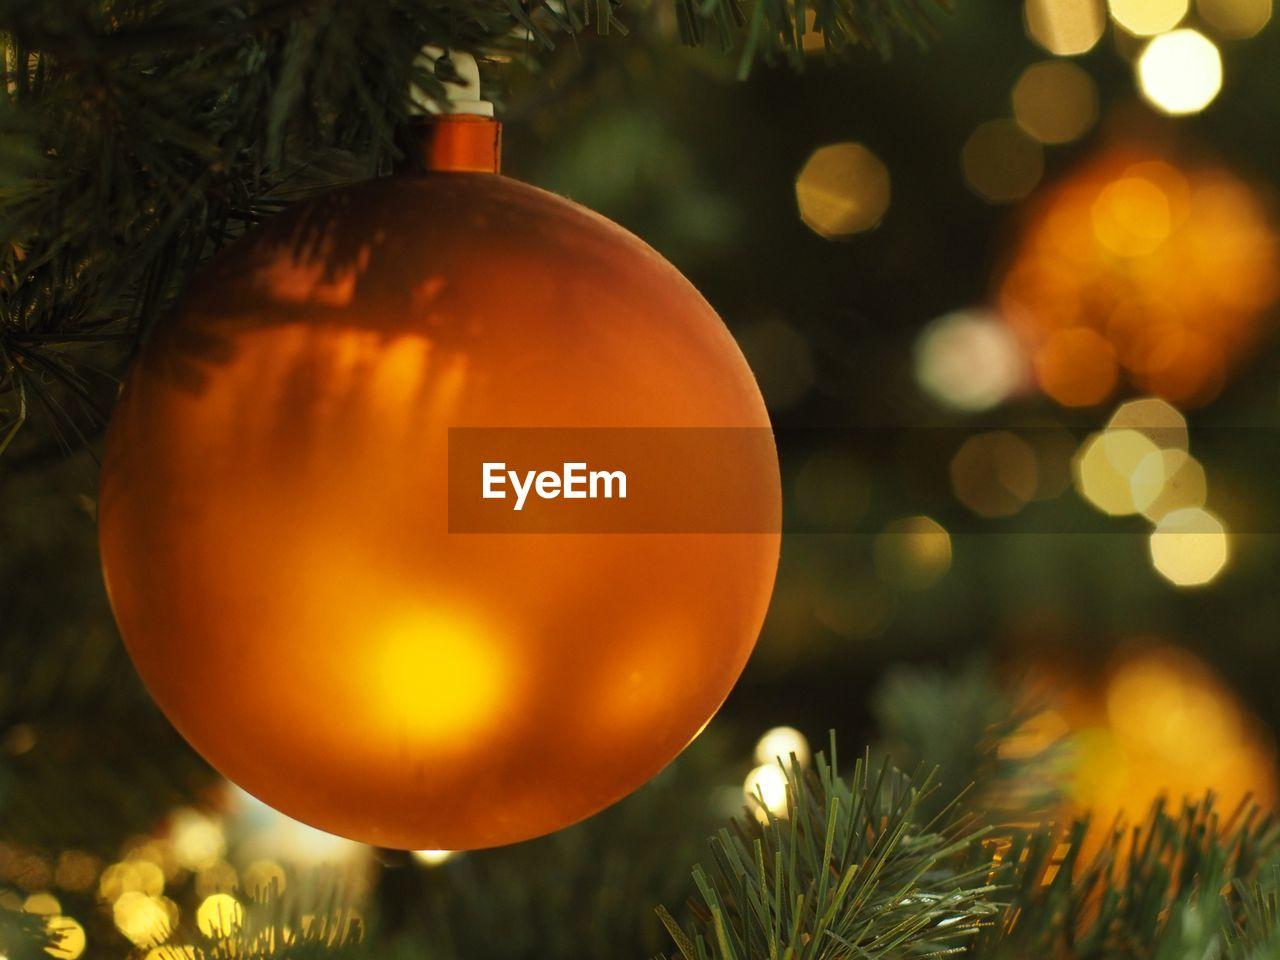 christmas, christmas decoration, christmas tree, decoration, christmas ornament, tree, celebration, holiday, illuminated, close-up, christmas lights, celebration event, holiday - event, focus on foreground, no people, event, plant, sphere